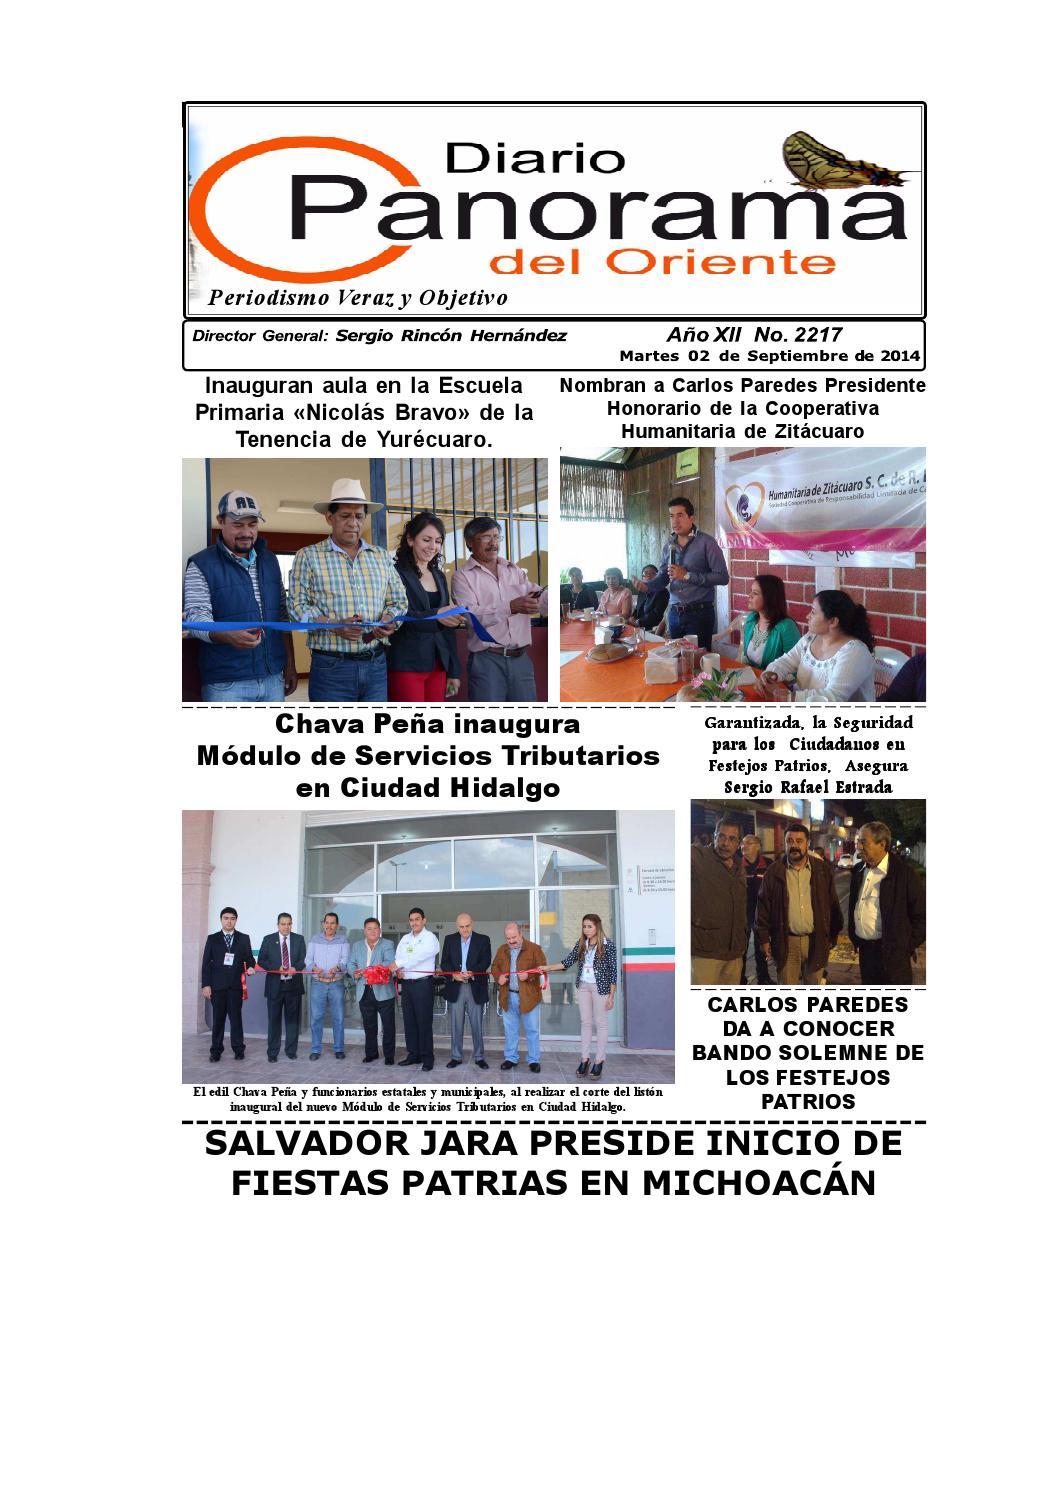 Diario Panorama 2 De Septiembre De 2014 By Vive Maravatio